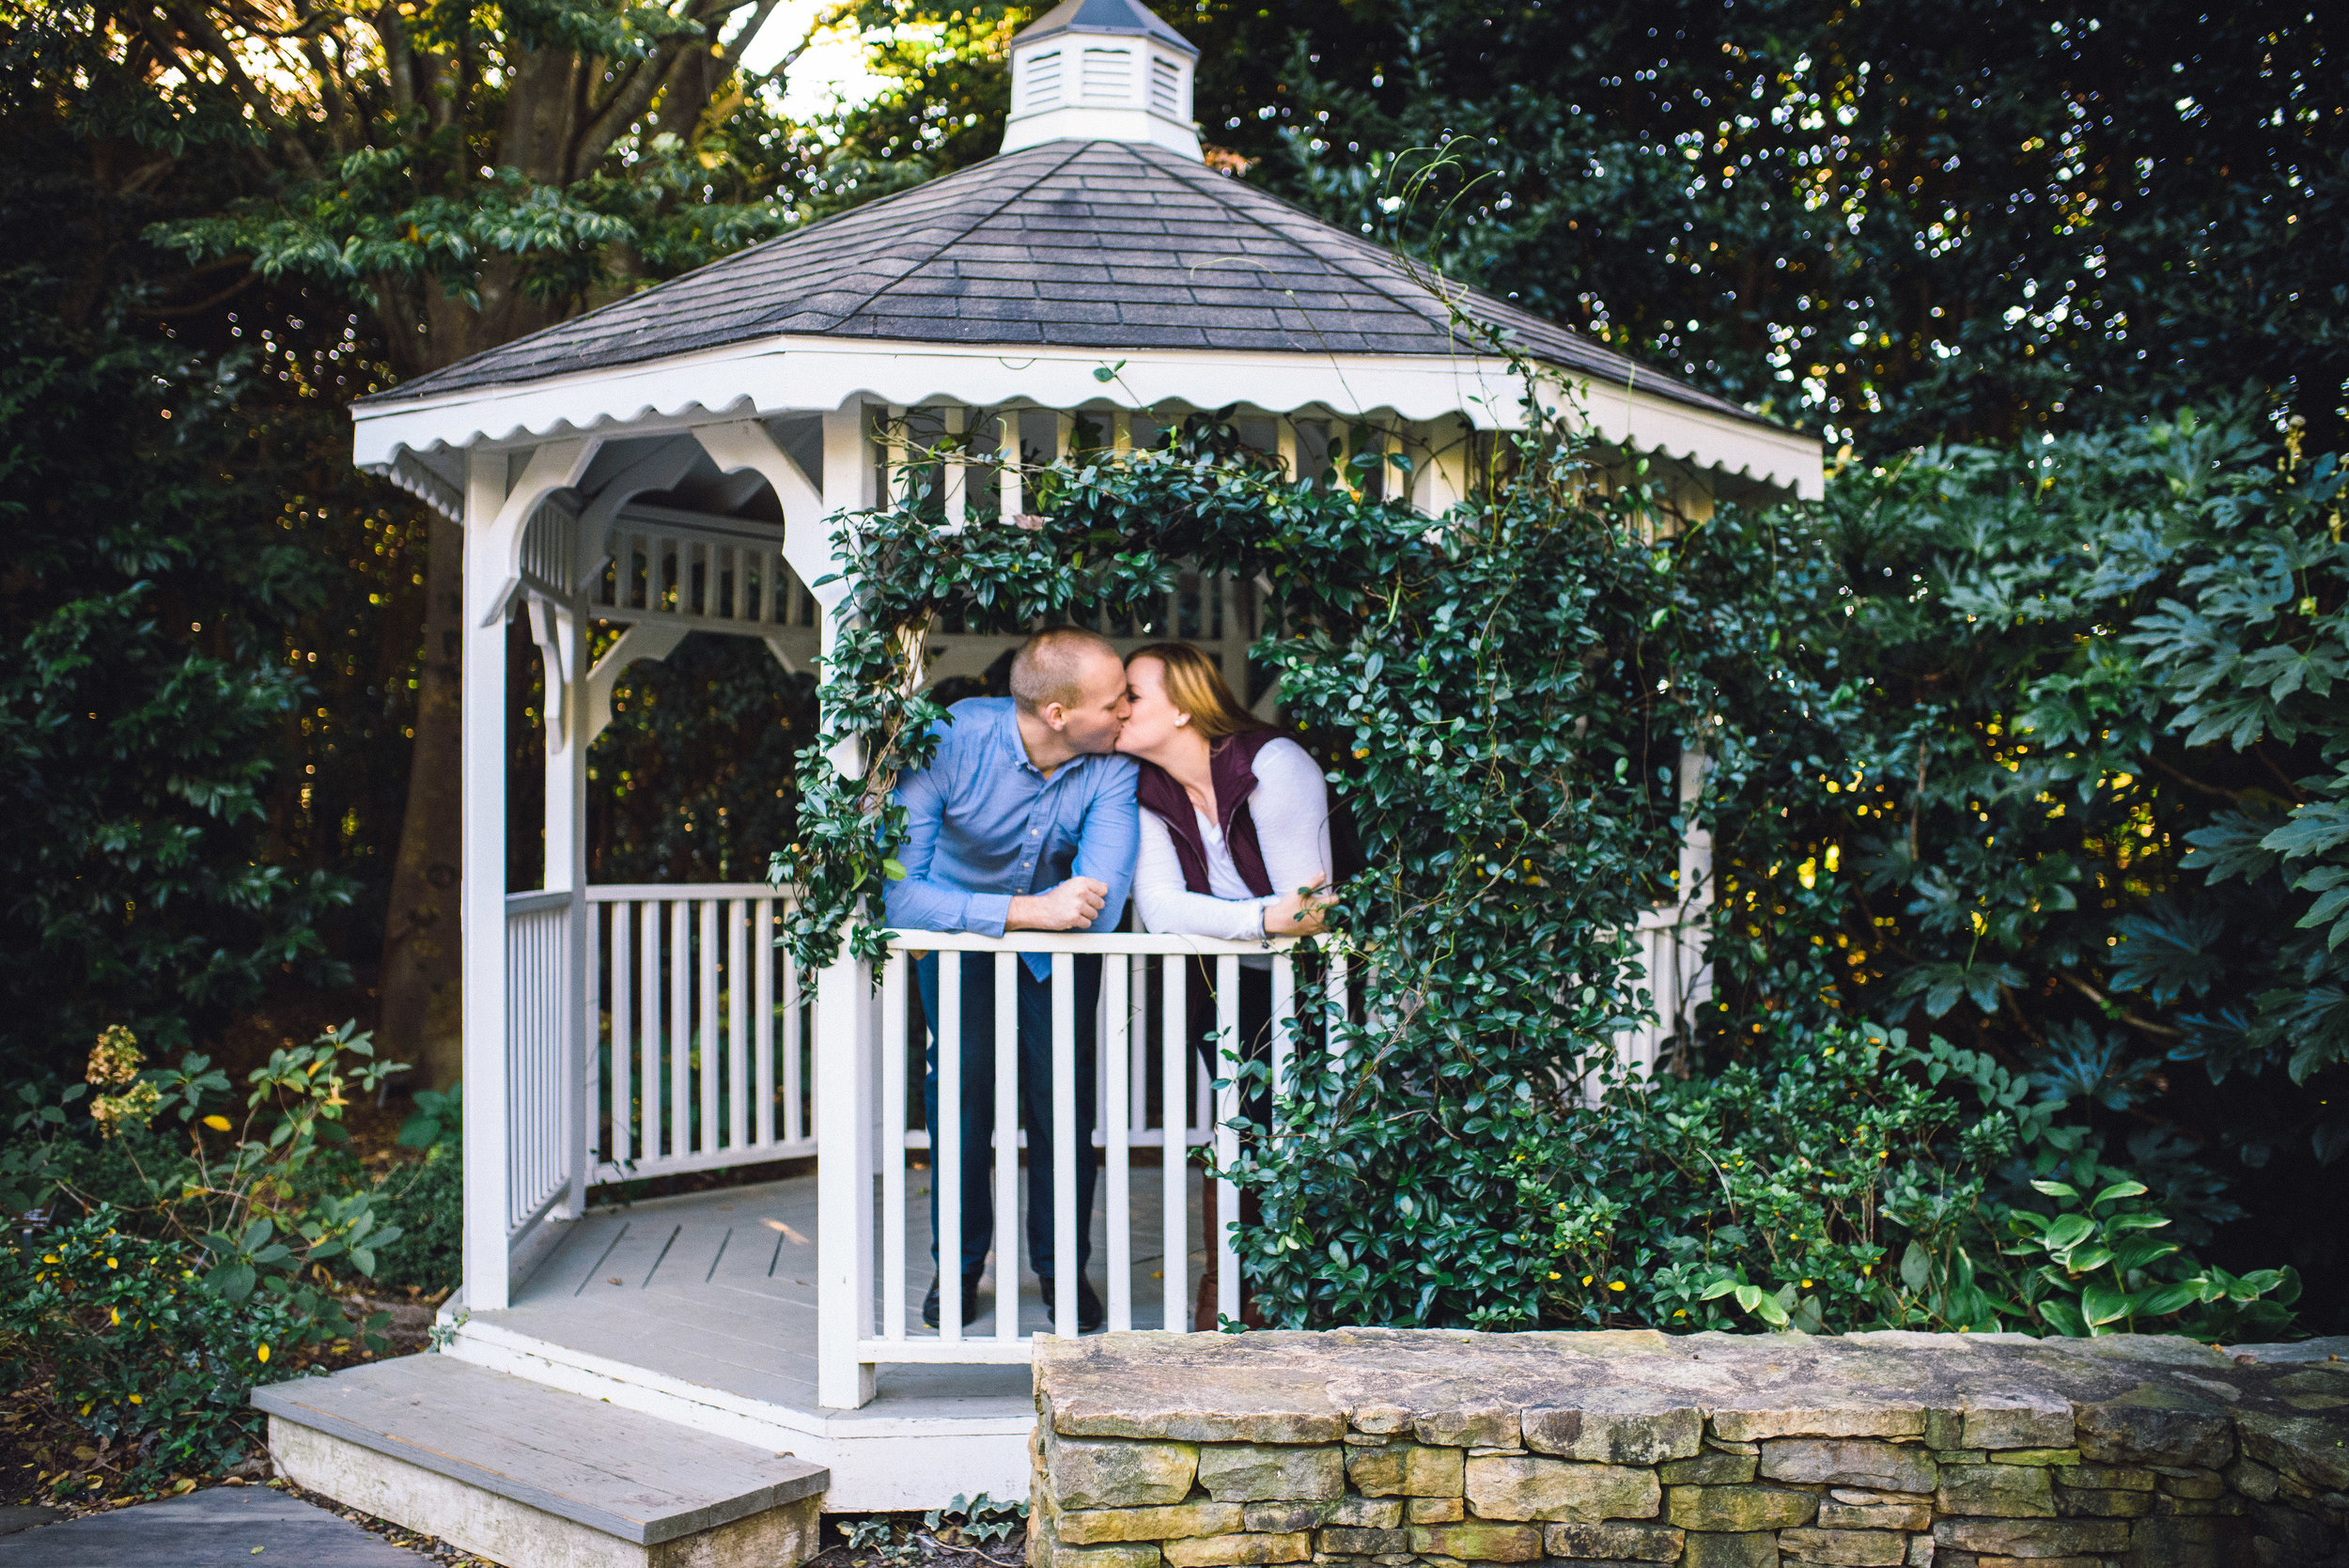 Raleigh Engagement Photographer - JC Raulston Arboretum Engagement